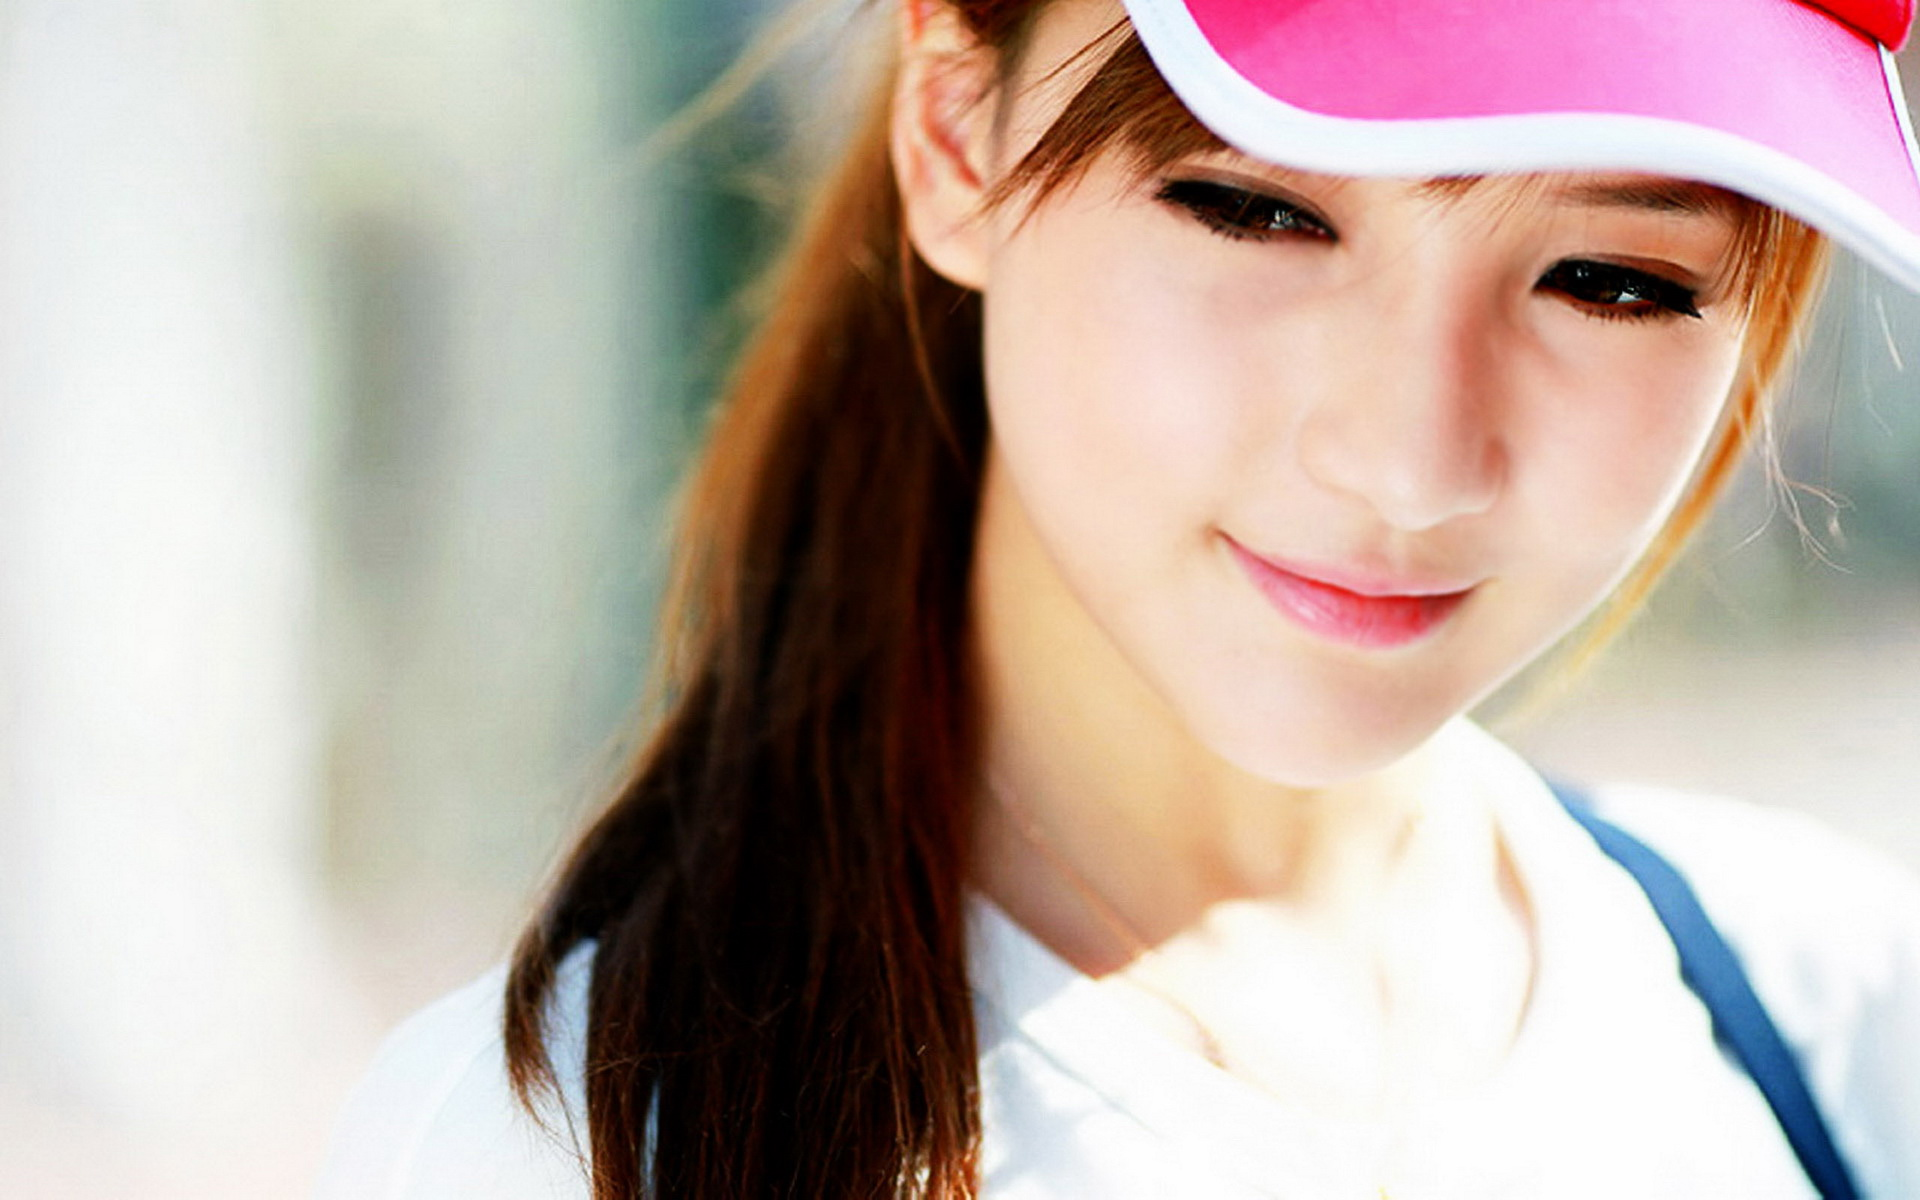 Girl wallpaper asian cute Girls Images